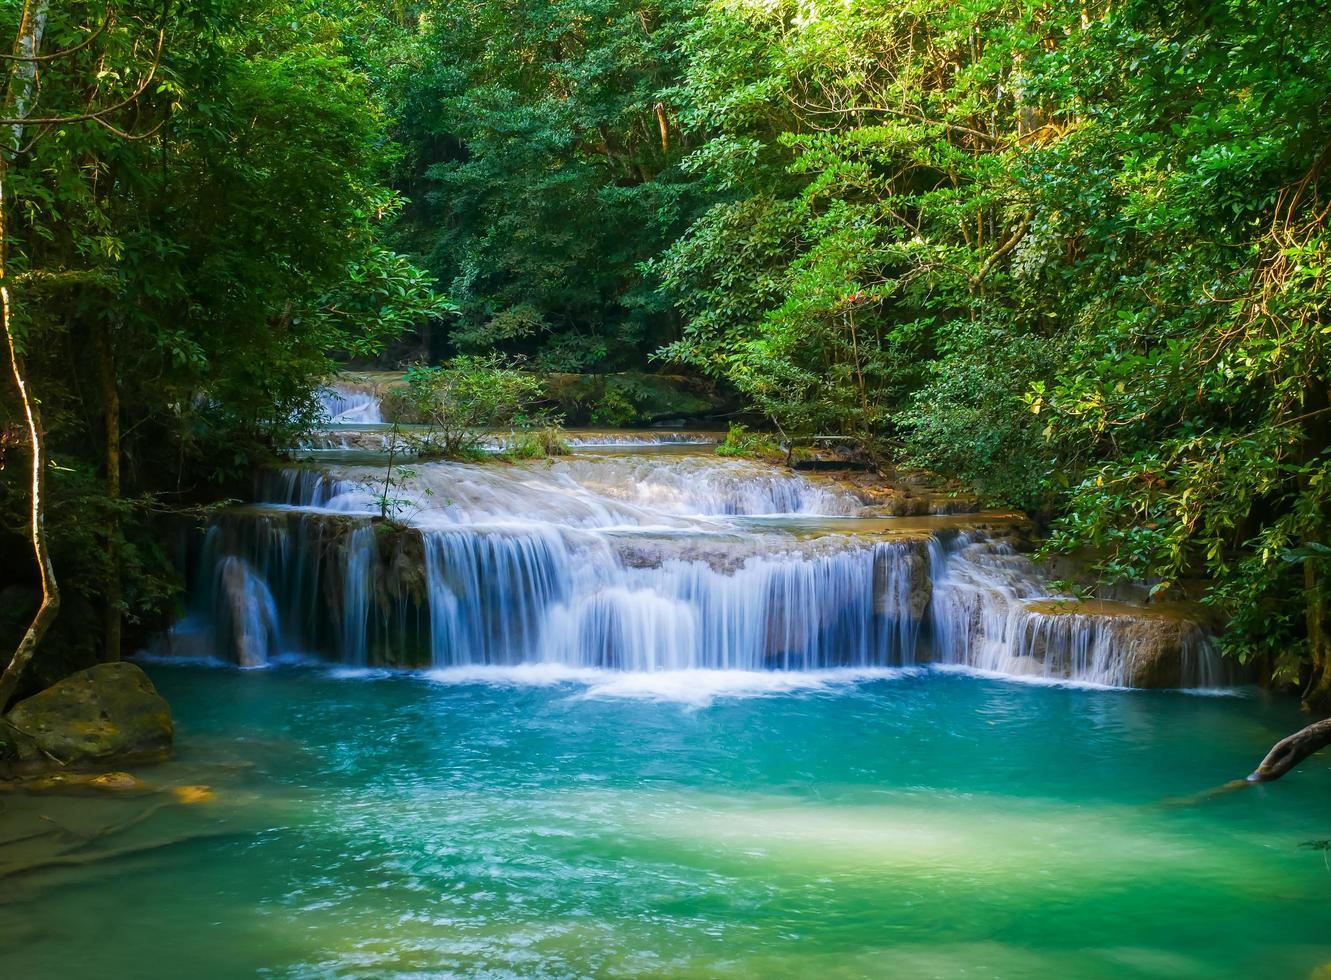 erawan vattenfall i regnskogen foto